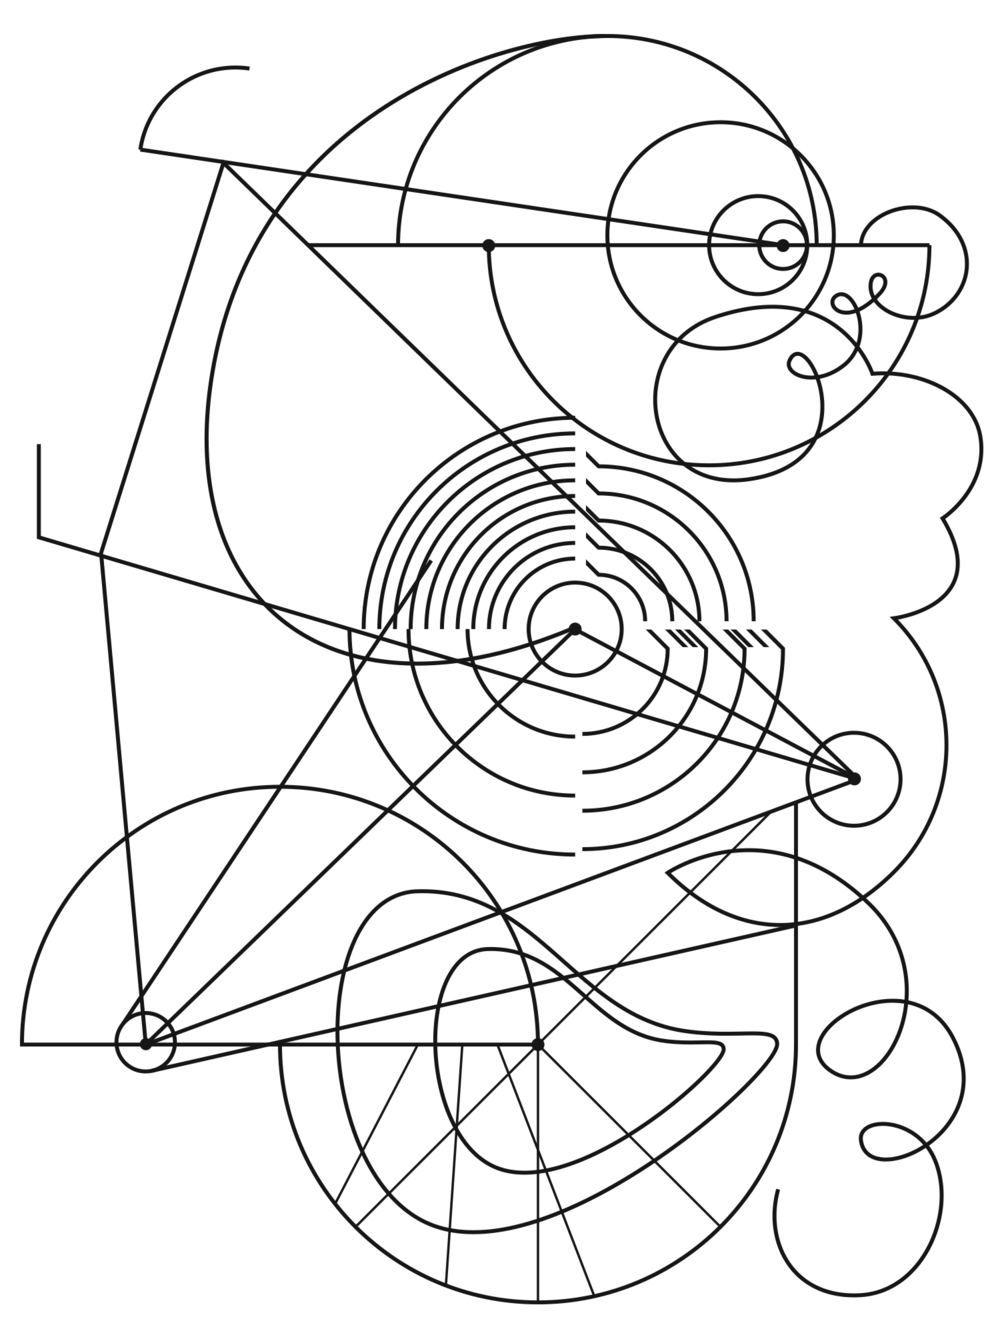 au-artcrank16-sketch9.jpg